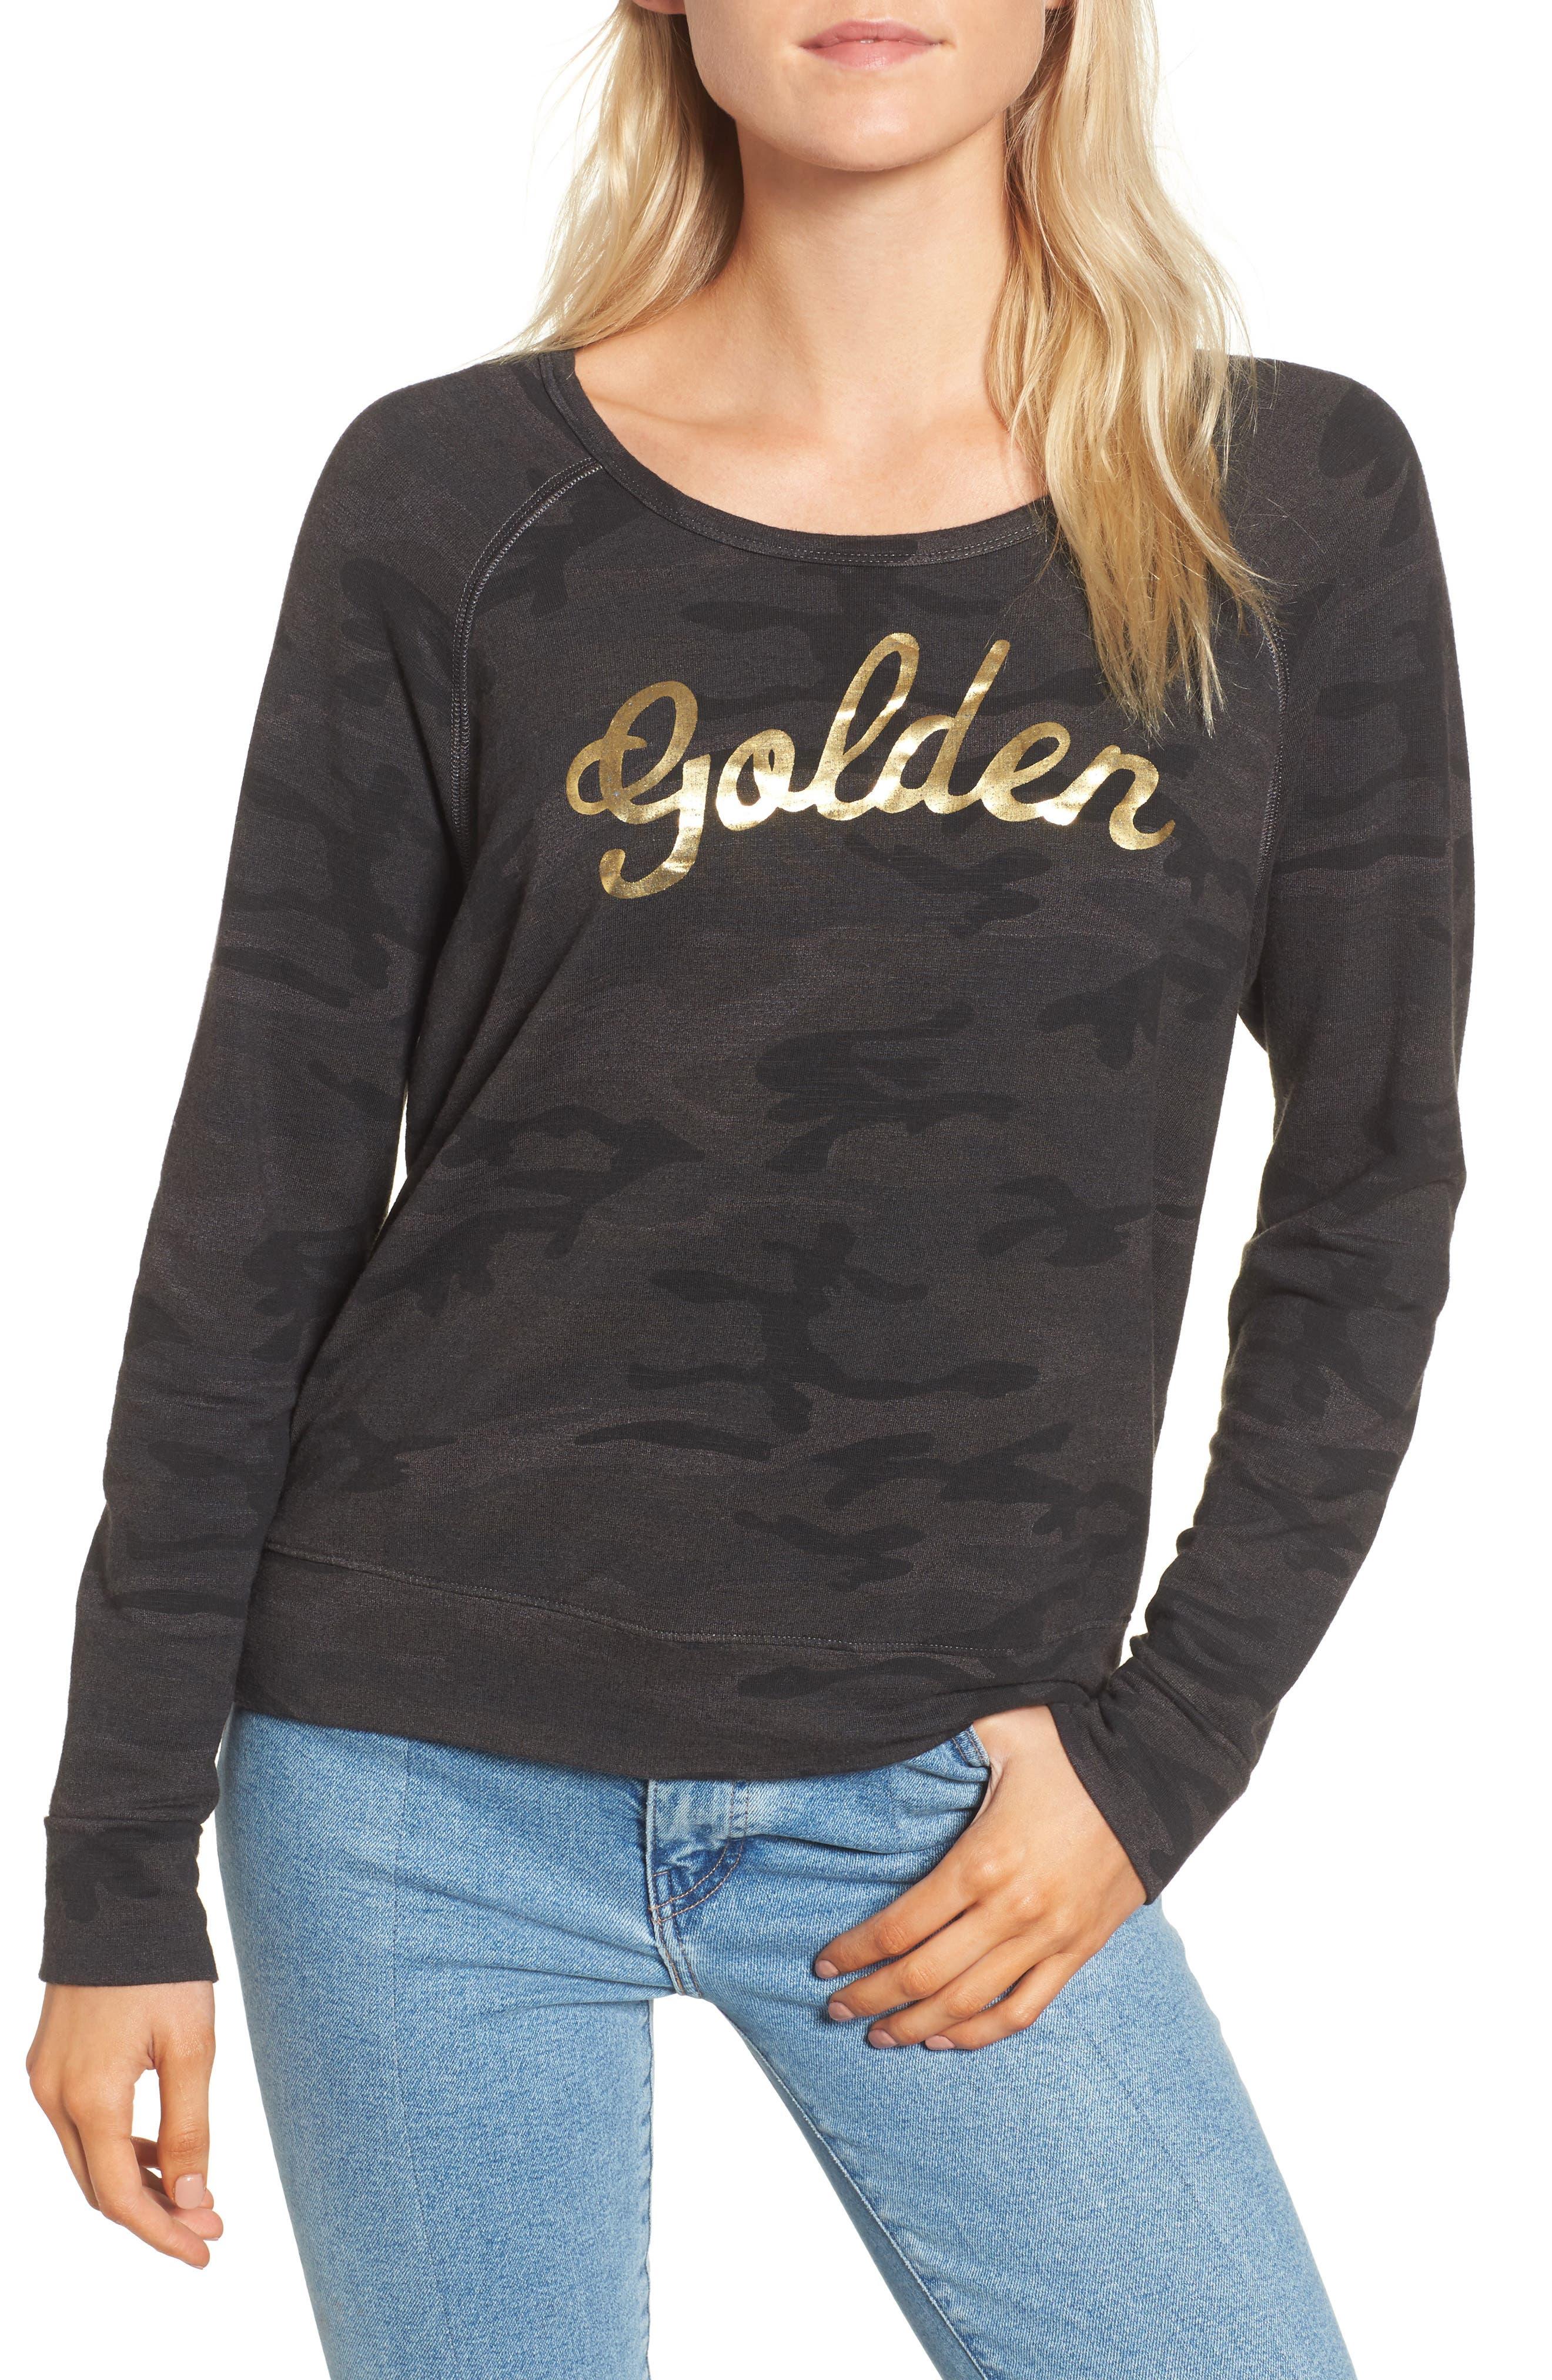 Active Golden Sweatshirt,                             Main thumbnail 1, color,                             020